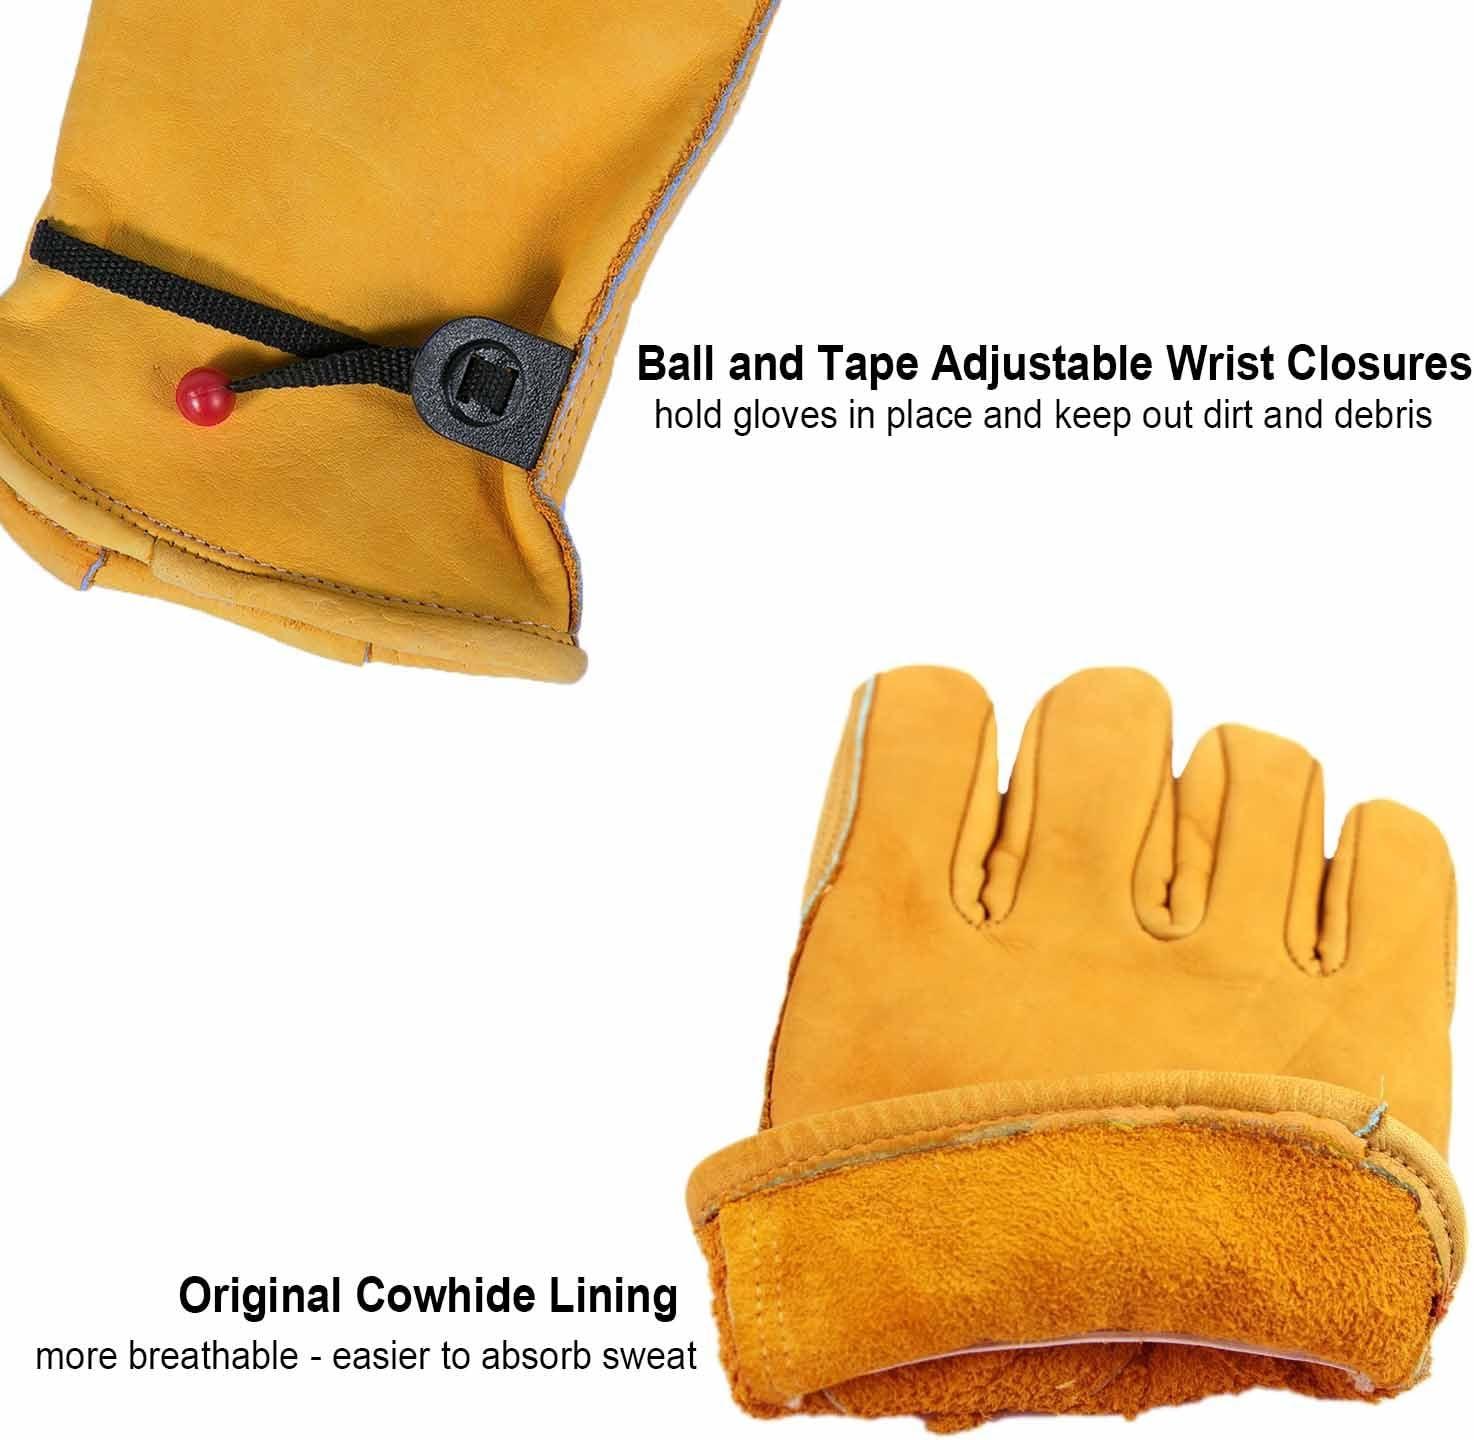 OZERO Arbeitshandschuhe,Lederhandschuhe zum Arbeiten Gartenarbeit